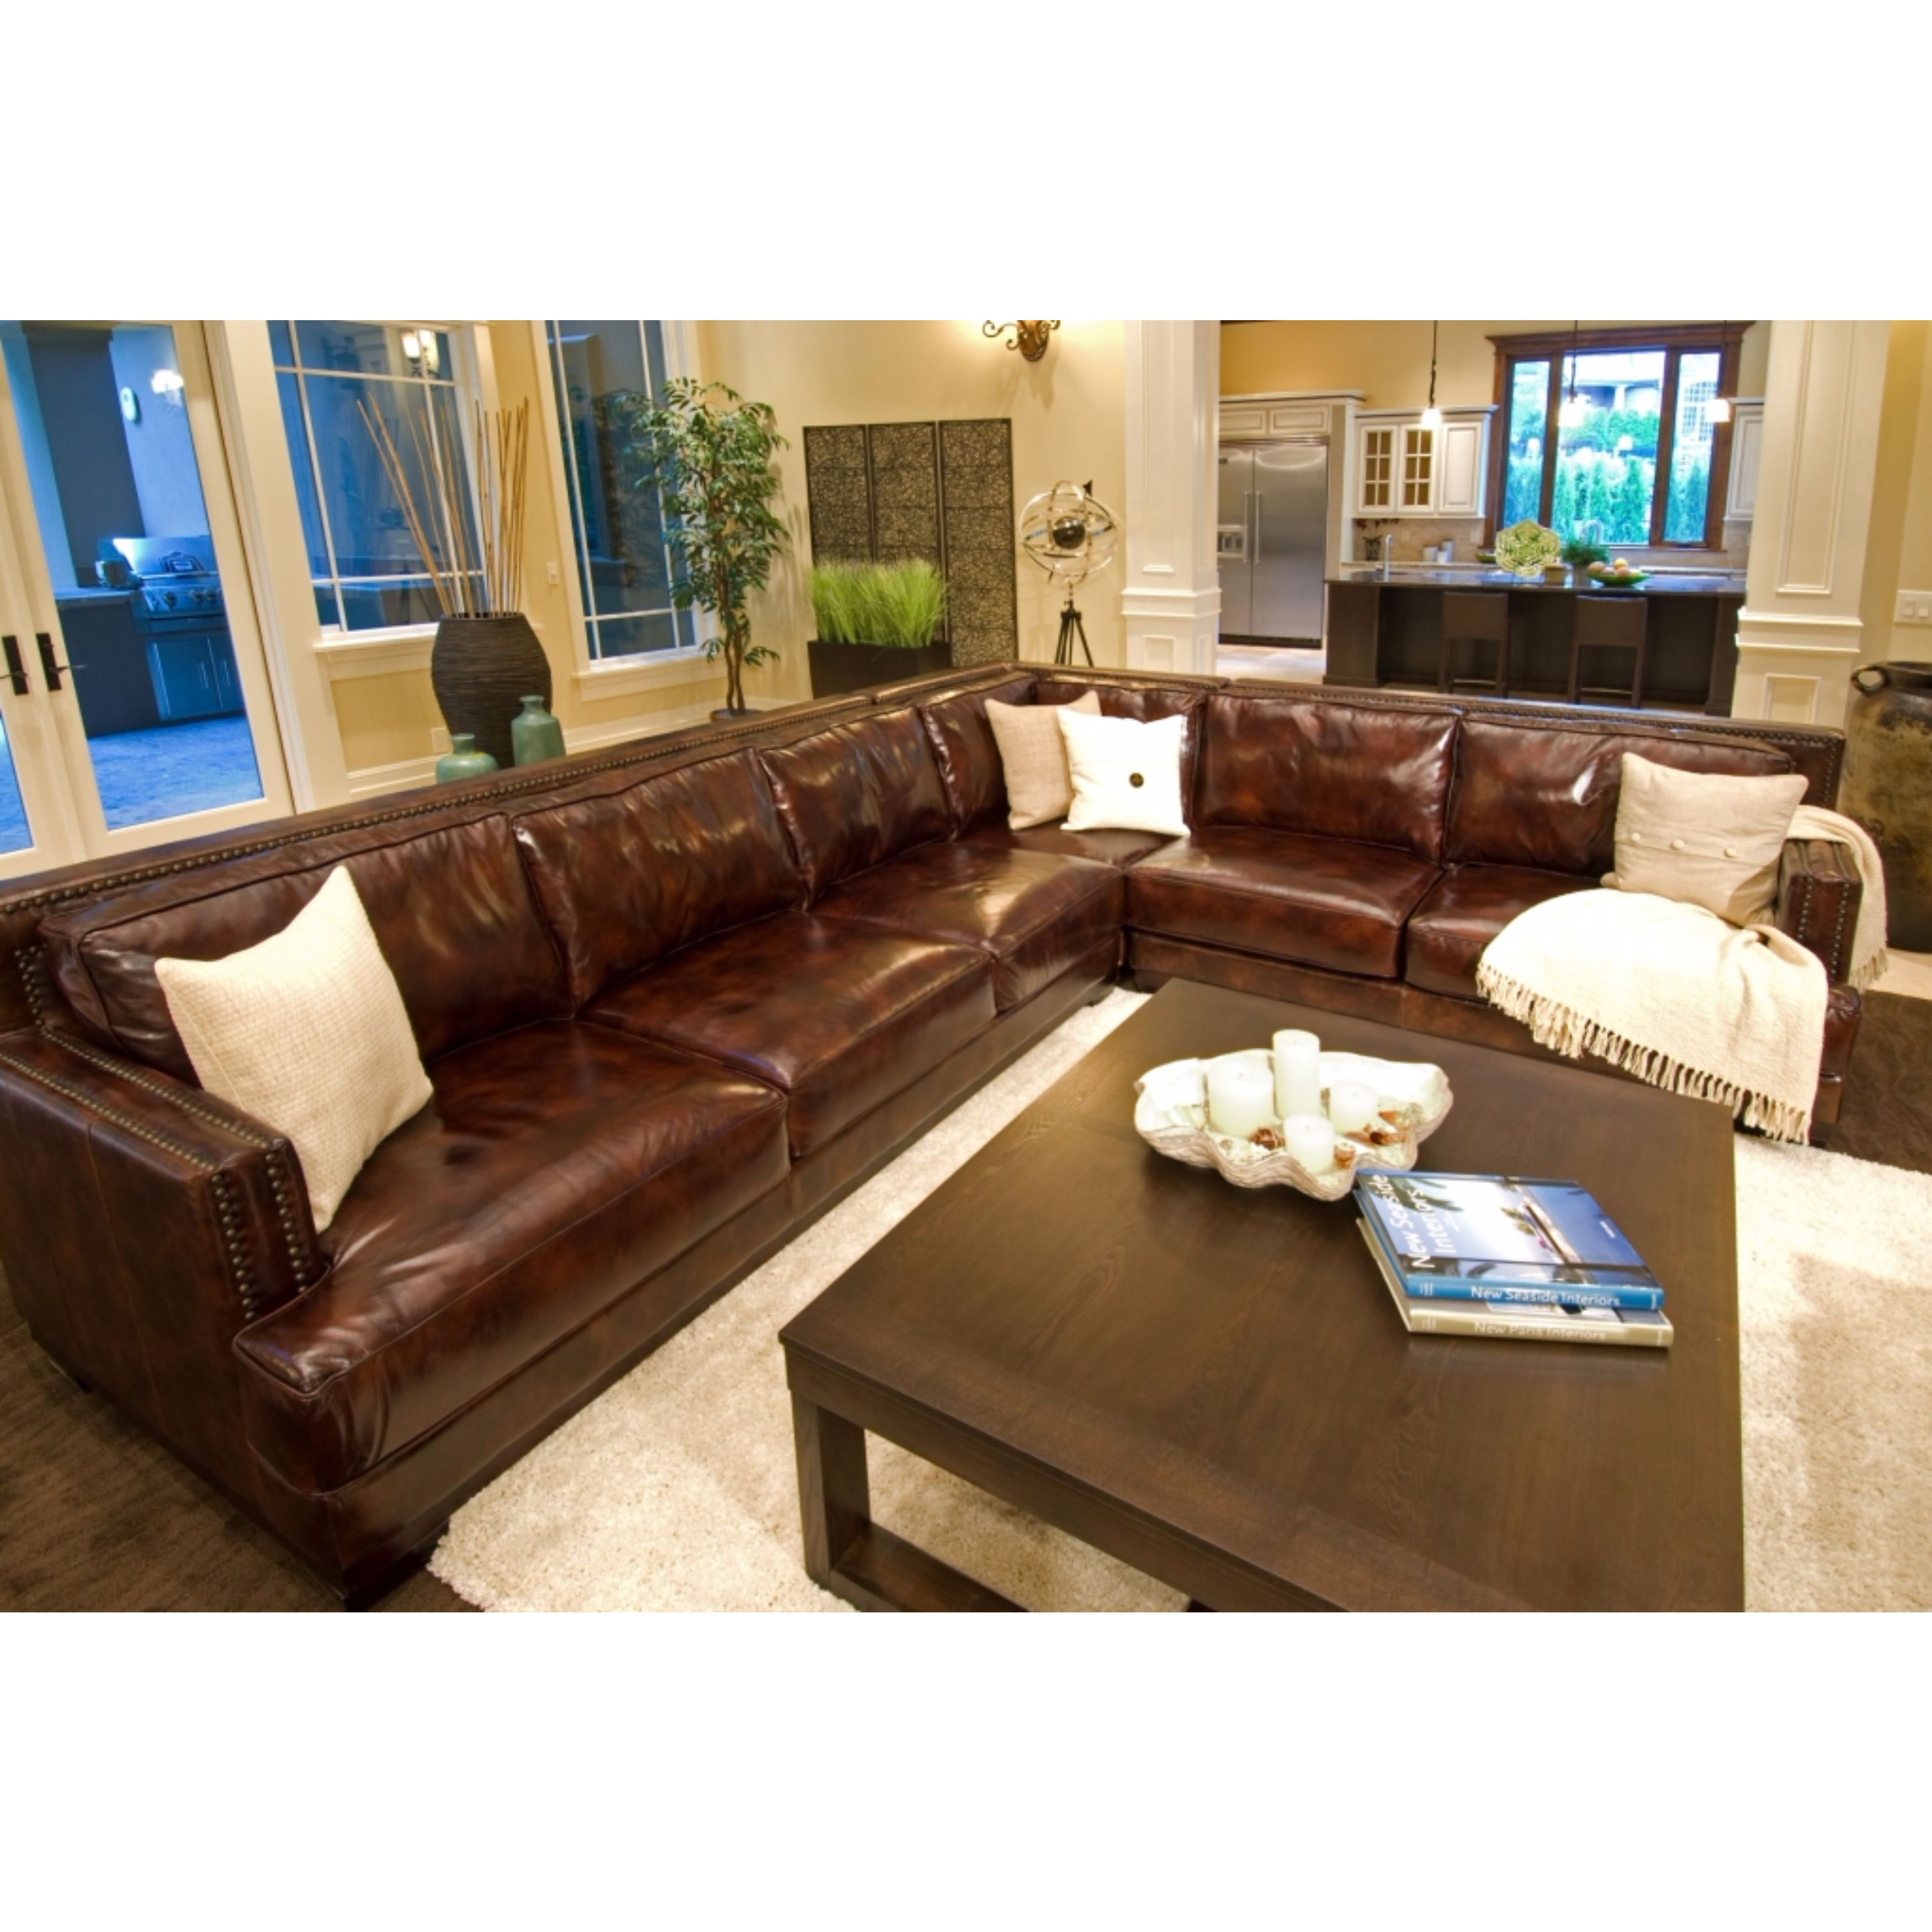 Easton Saddle Top Grain Leather Corner Sectional Sofa